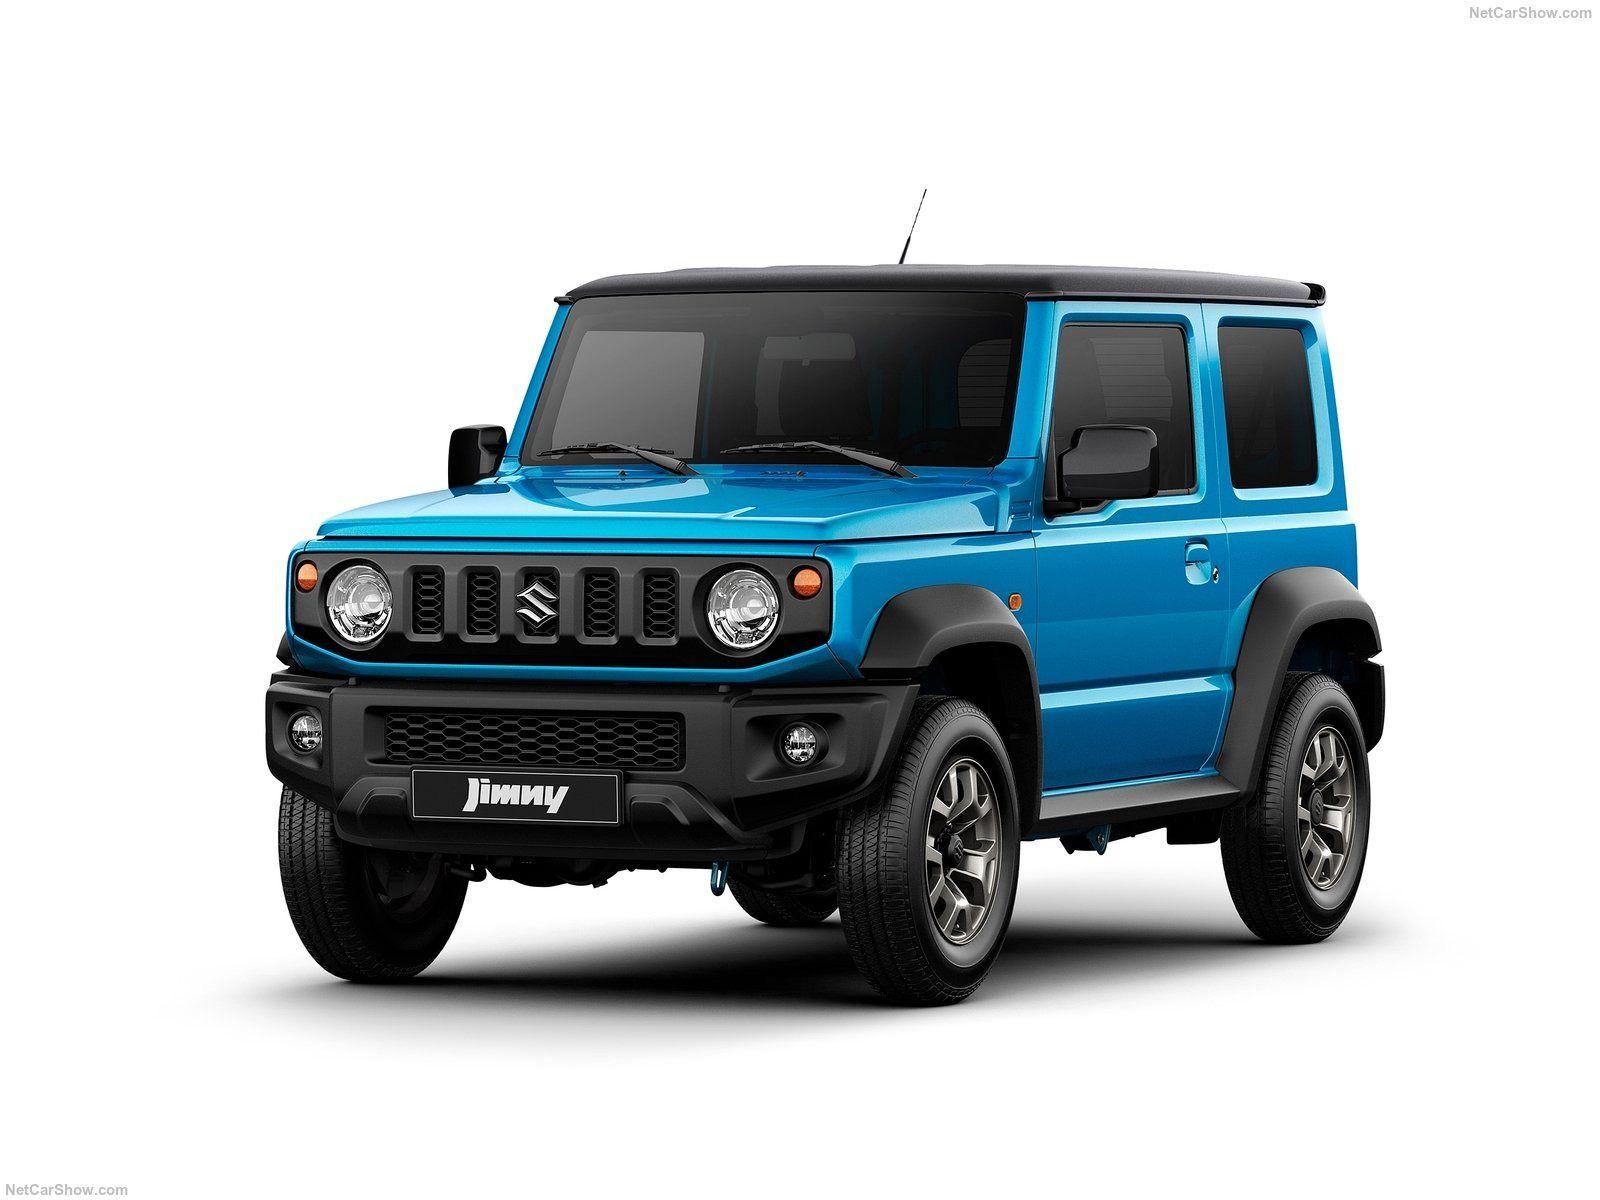 Suzuki Jimny 2019 Prices In Pakistan Reviews Suzuki Jimny New Suzuki Jimny Suzuki